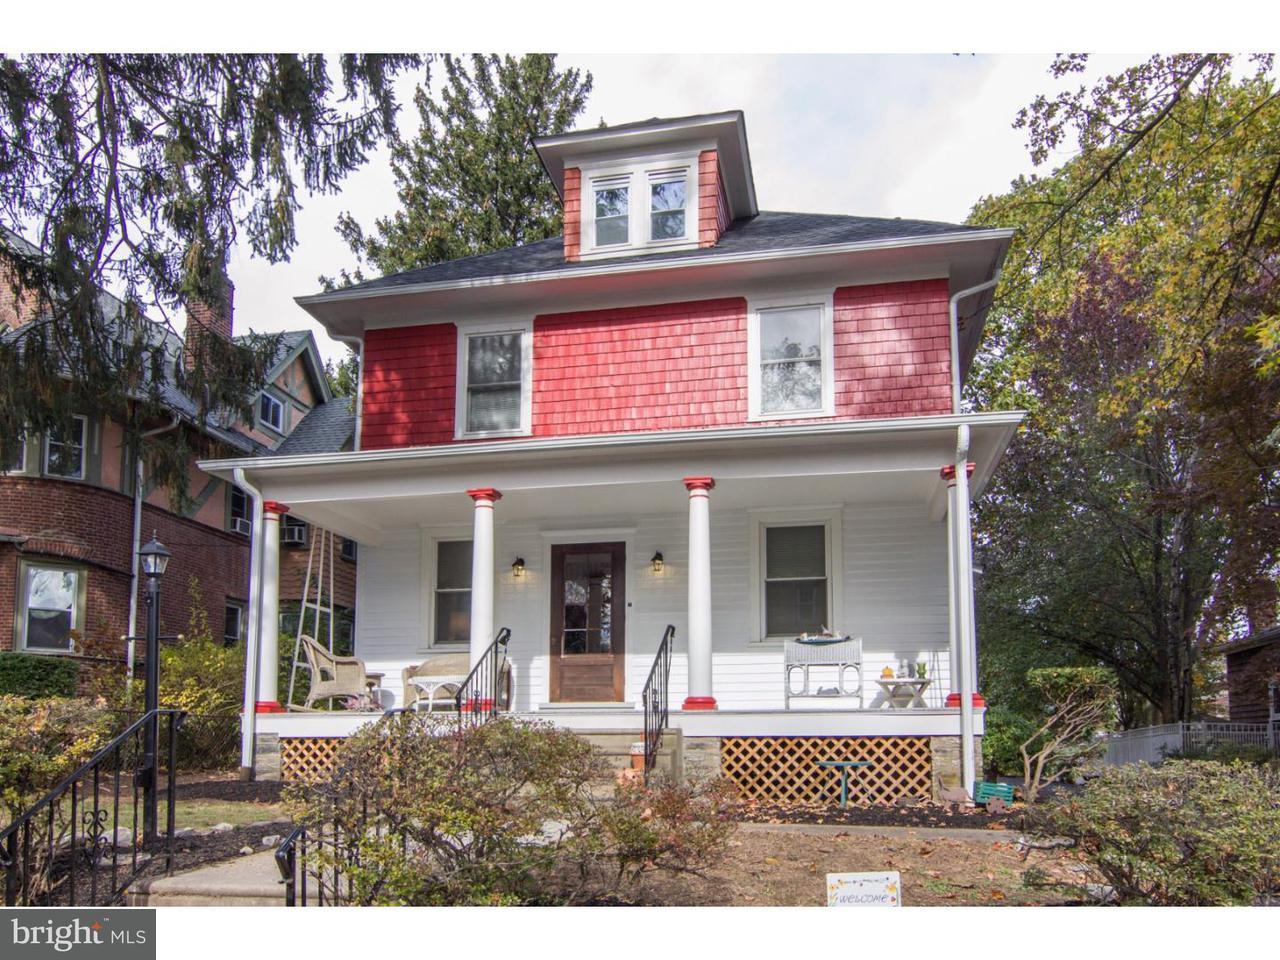 Single Family Home for Sale at 2245 MENLO Avenue Glenside, Pennsylvania 19038 United States